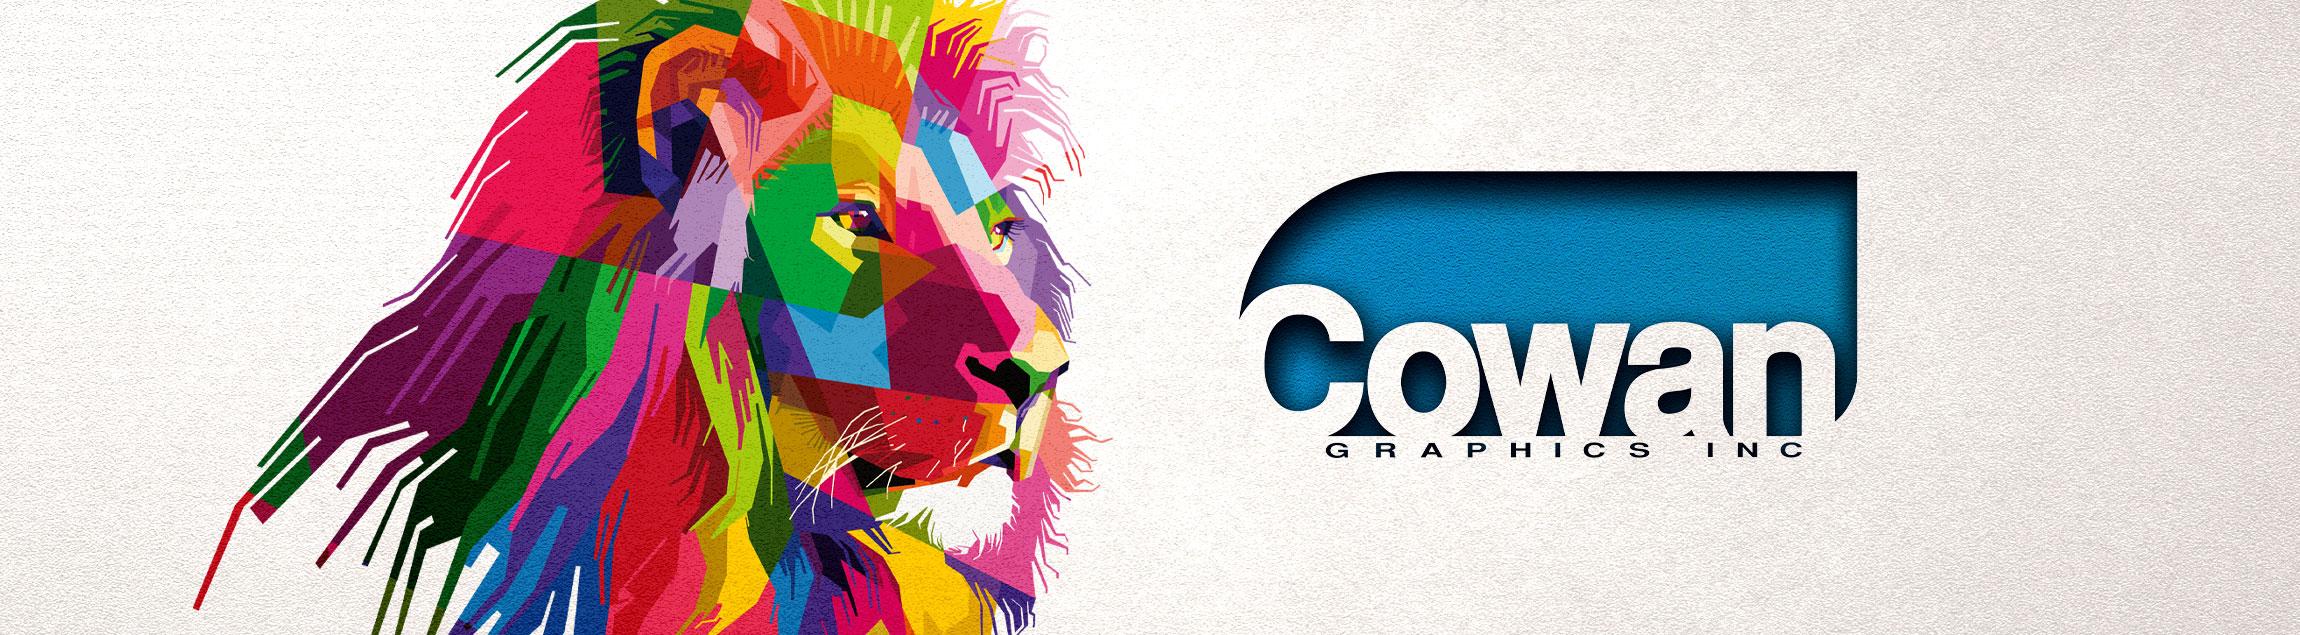 Cowan Graphics - Lion Banner